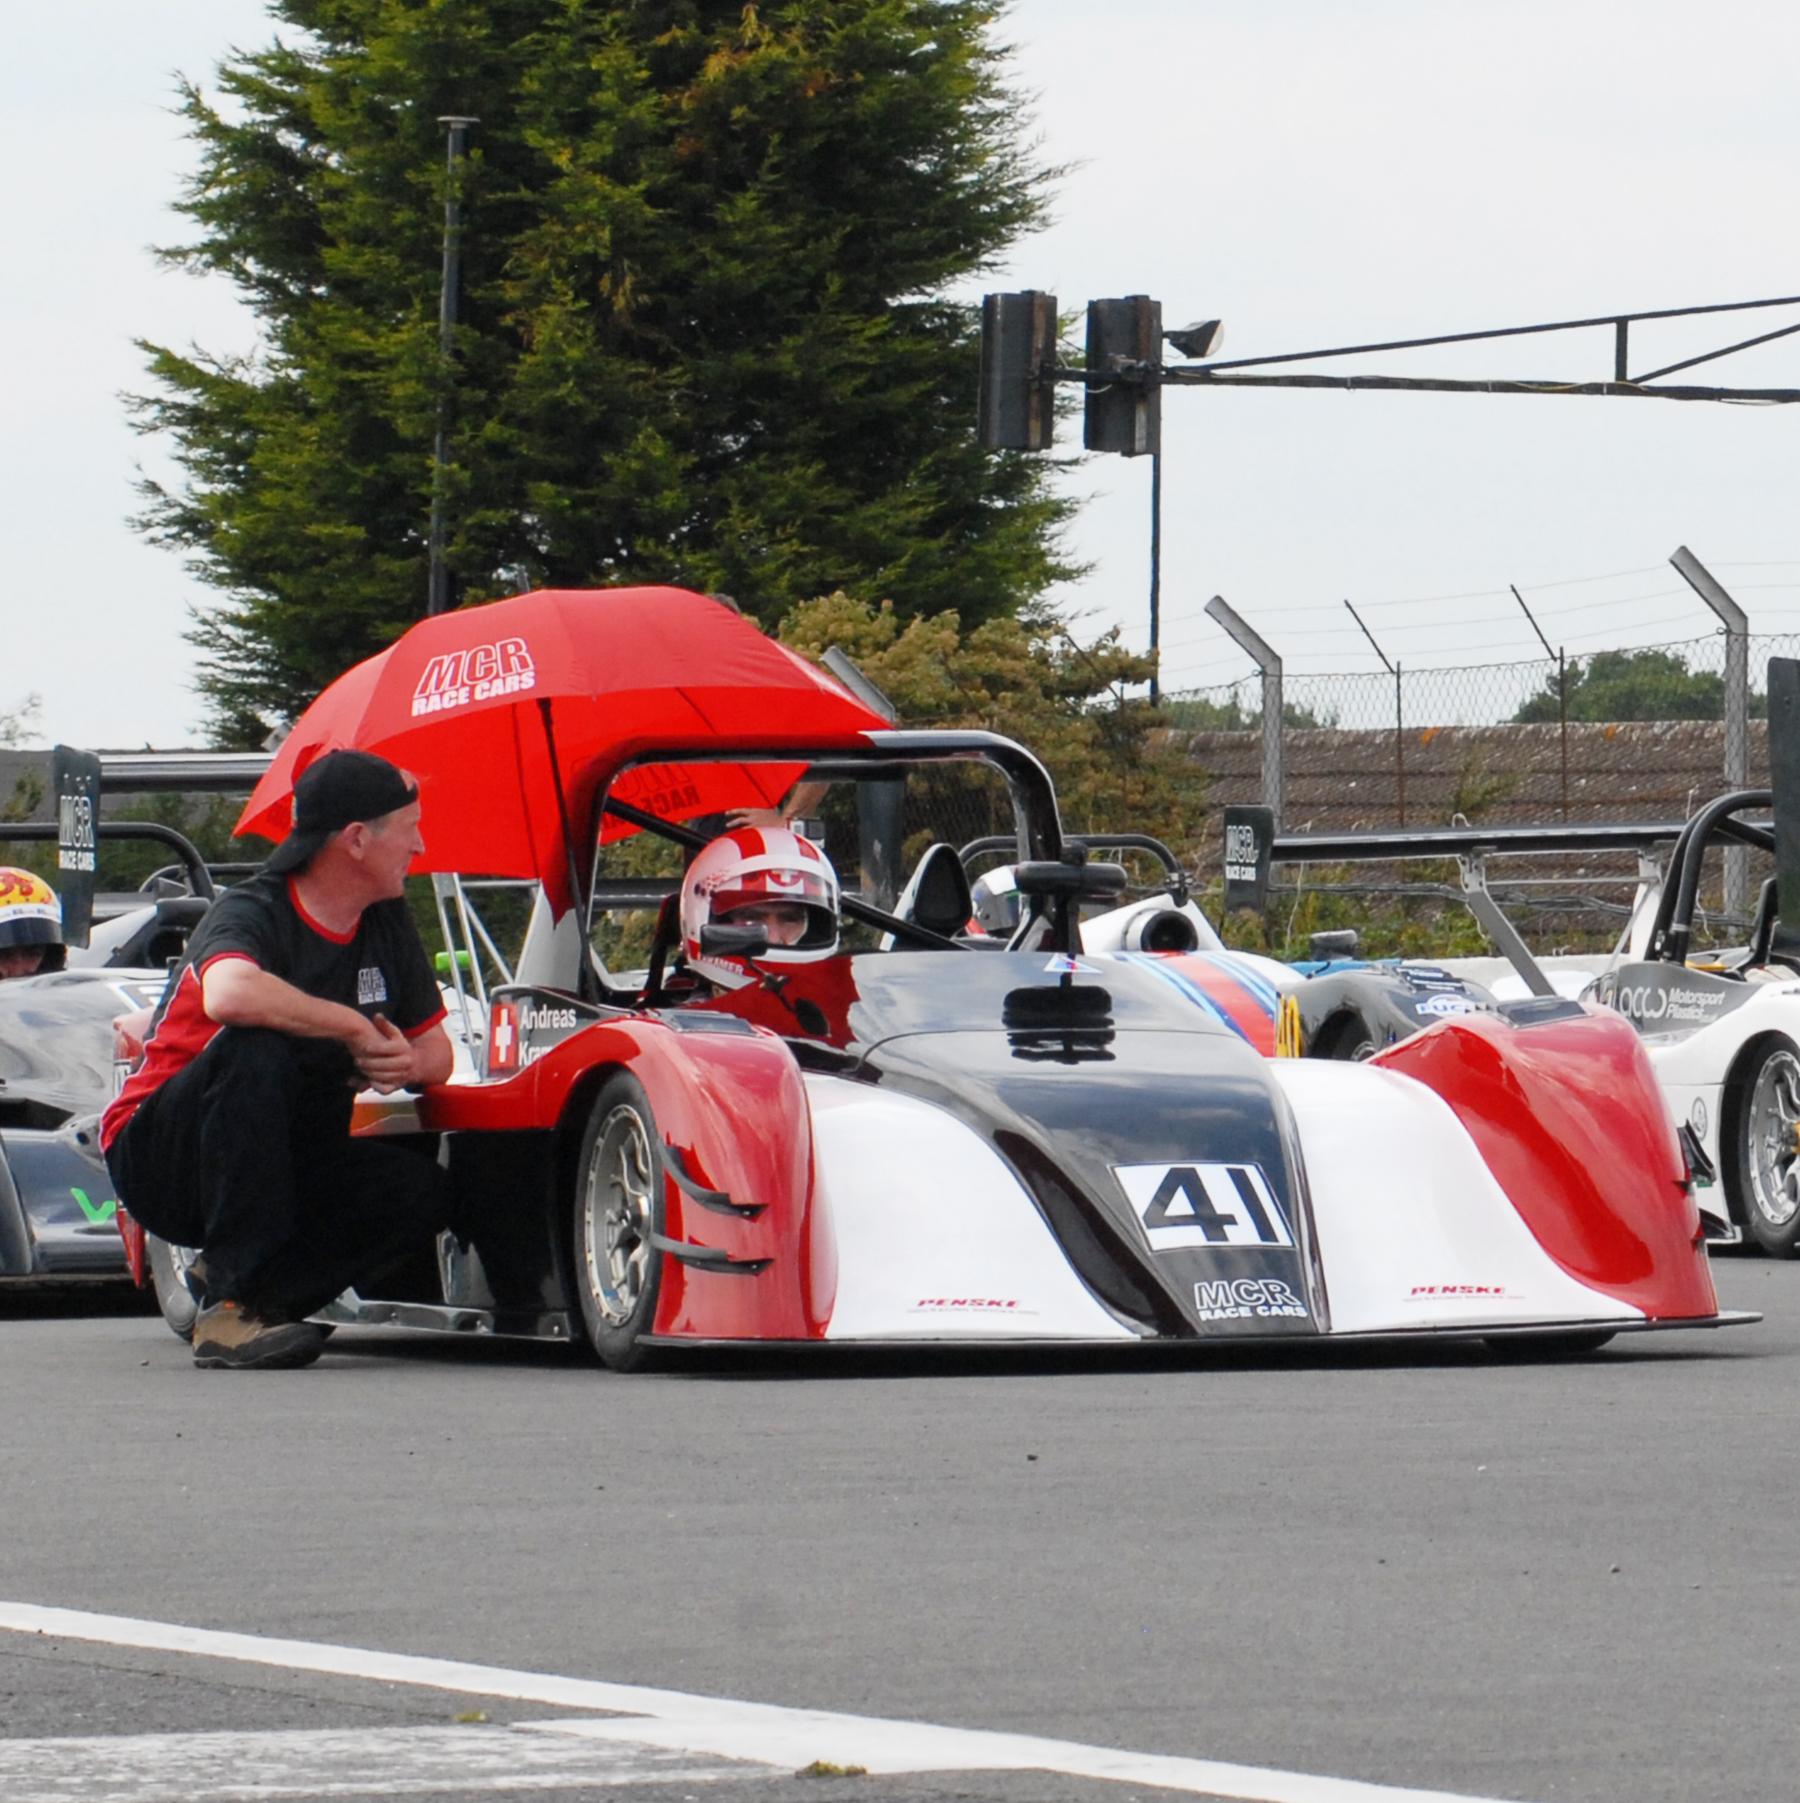 Andreas Kramer MCR Race Car driver Donington Park